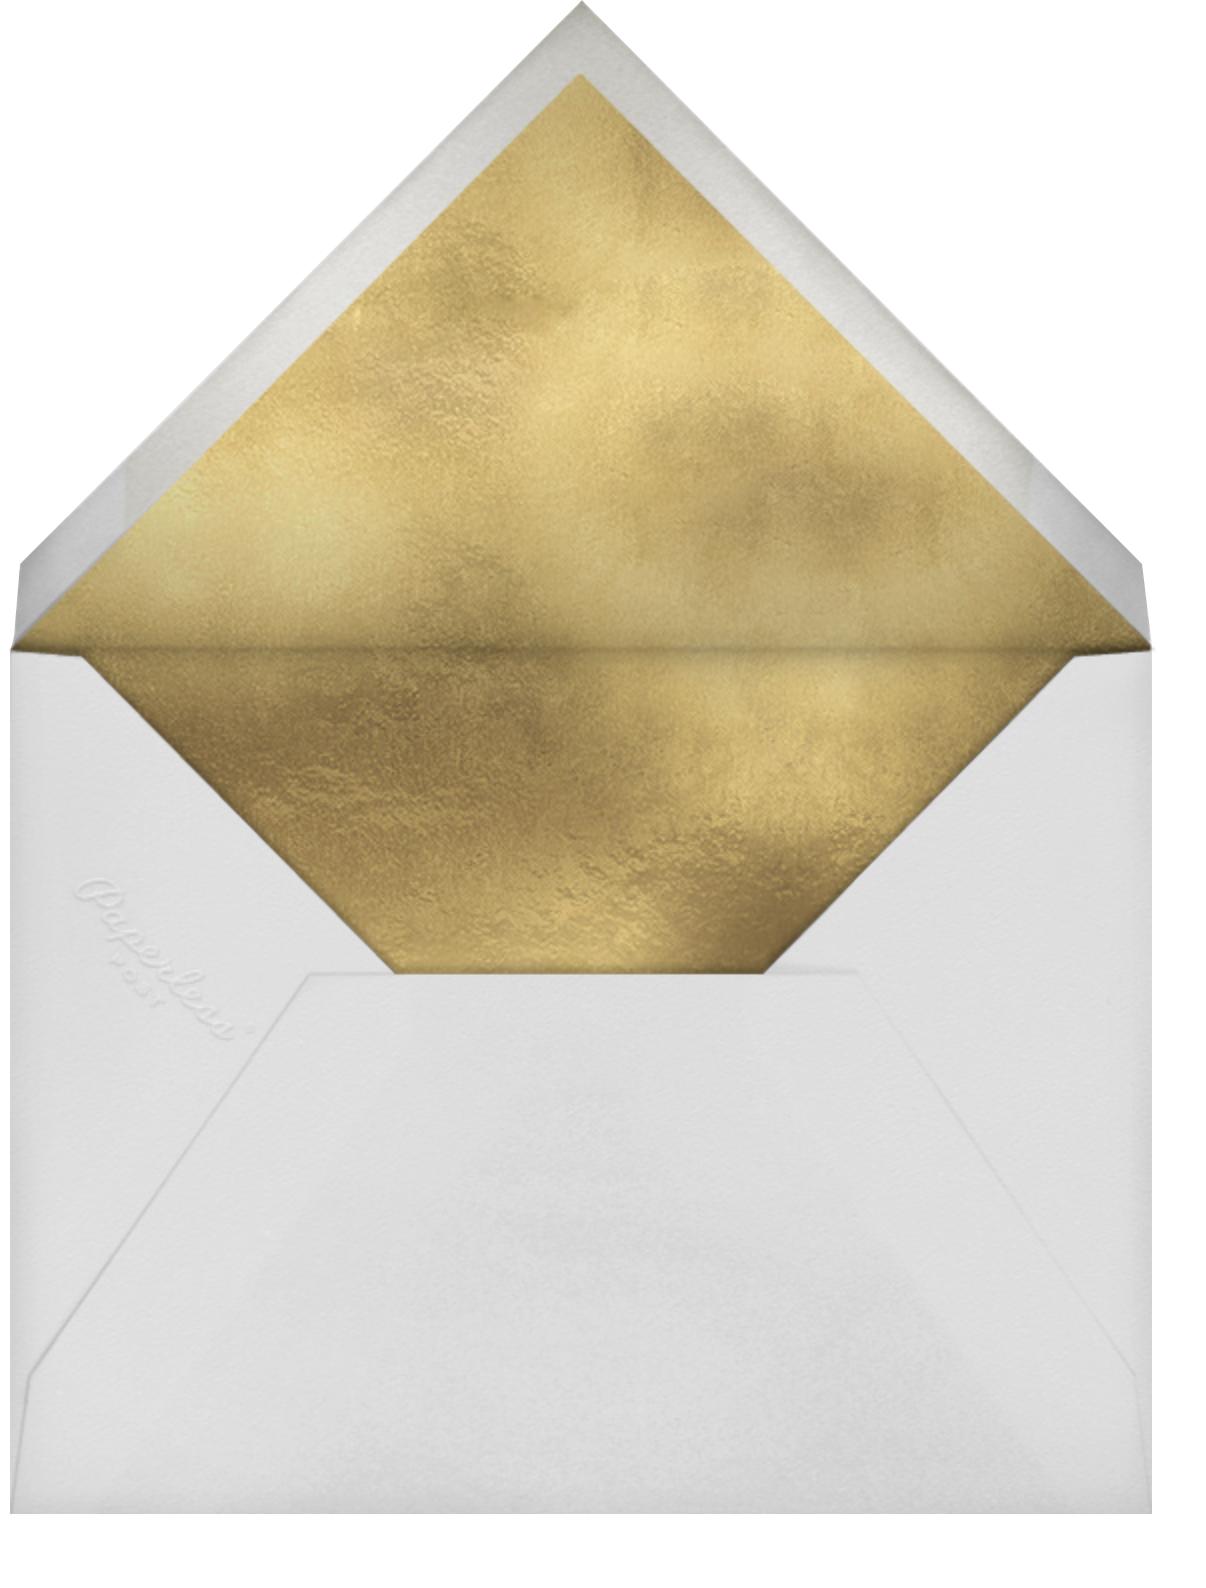 Leopard Border - White - kate spade new york - Bachelorette party - envelope back